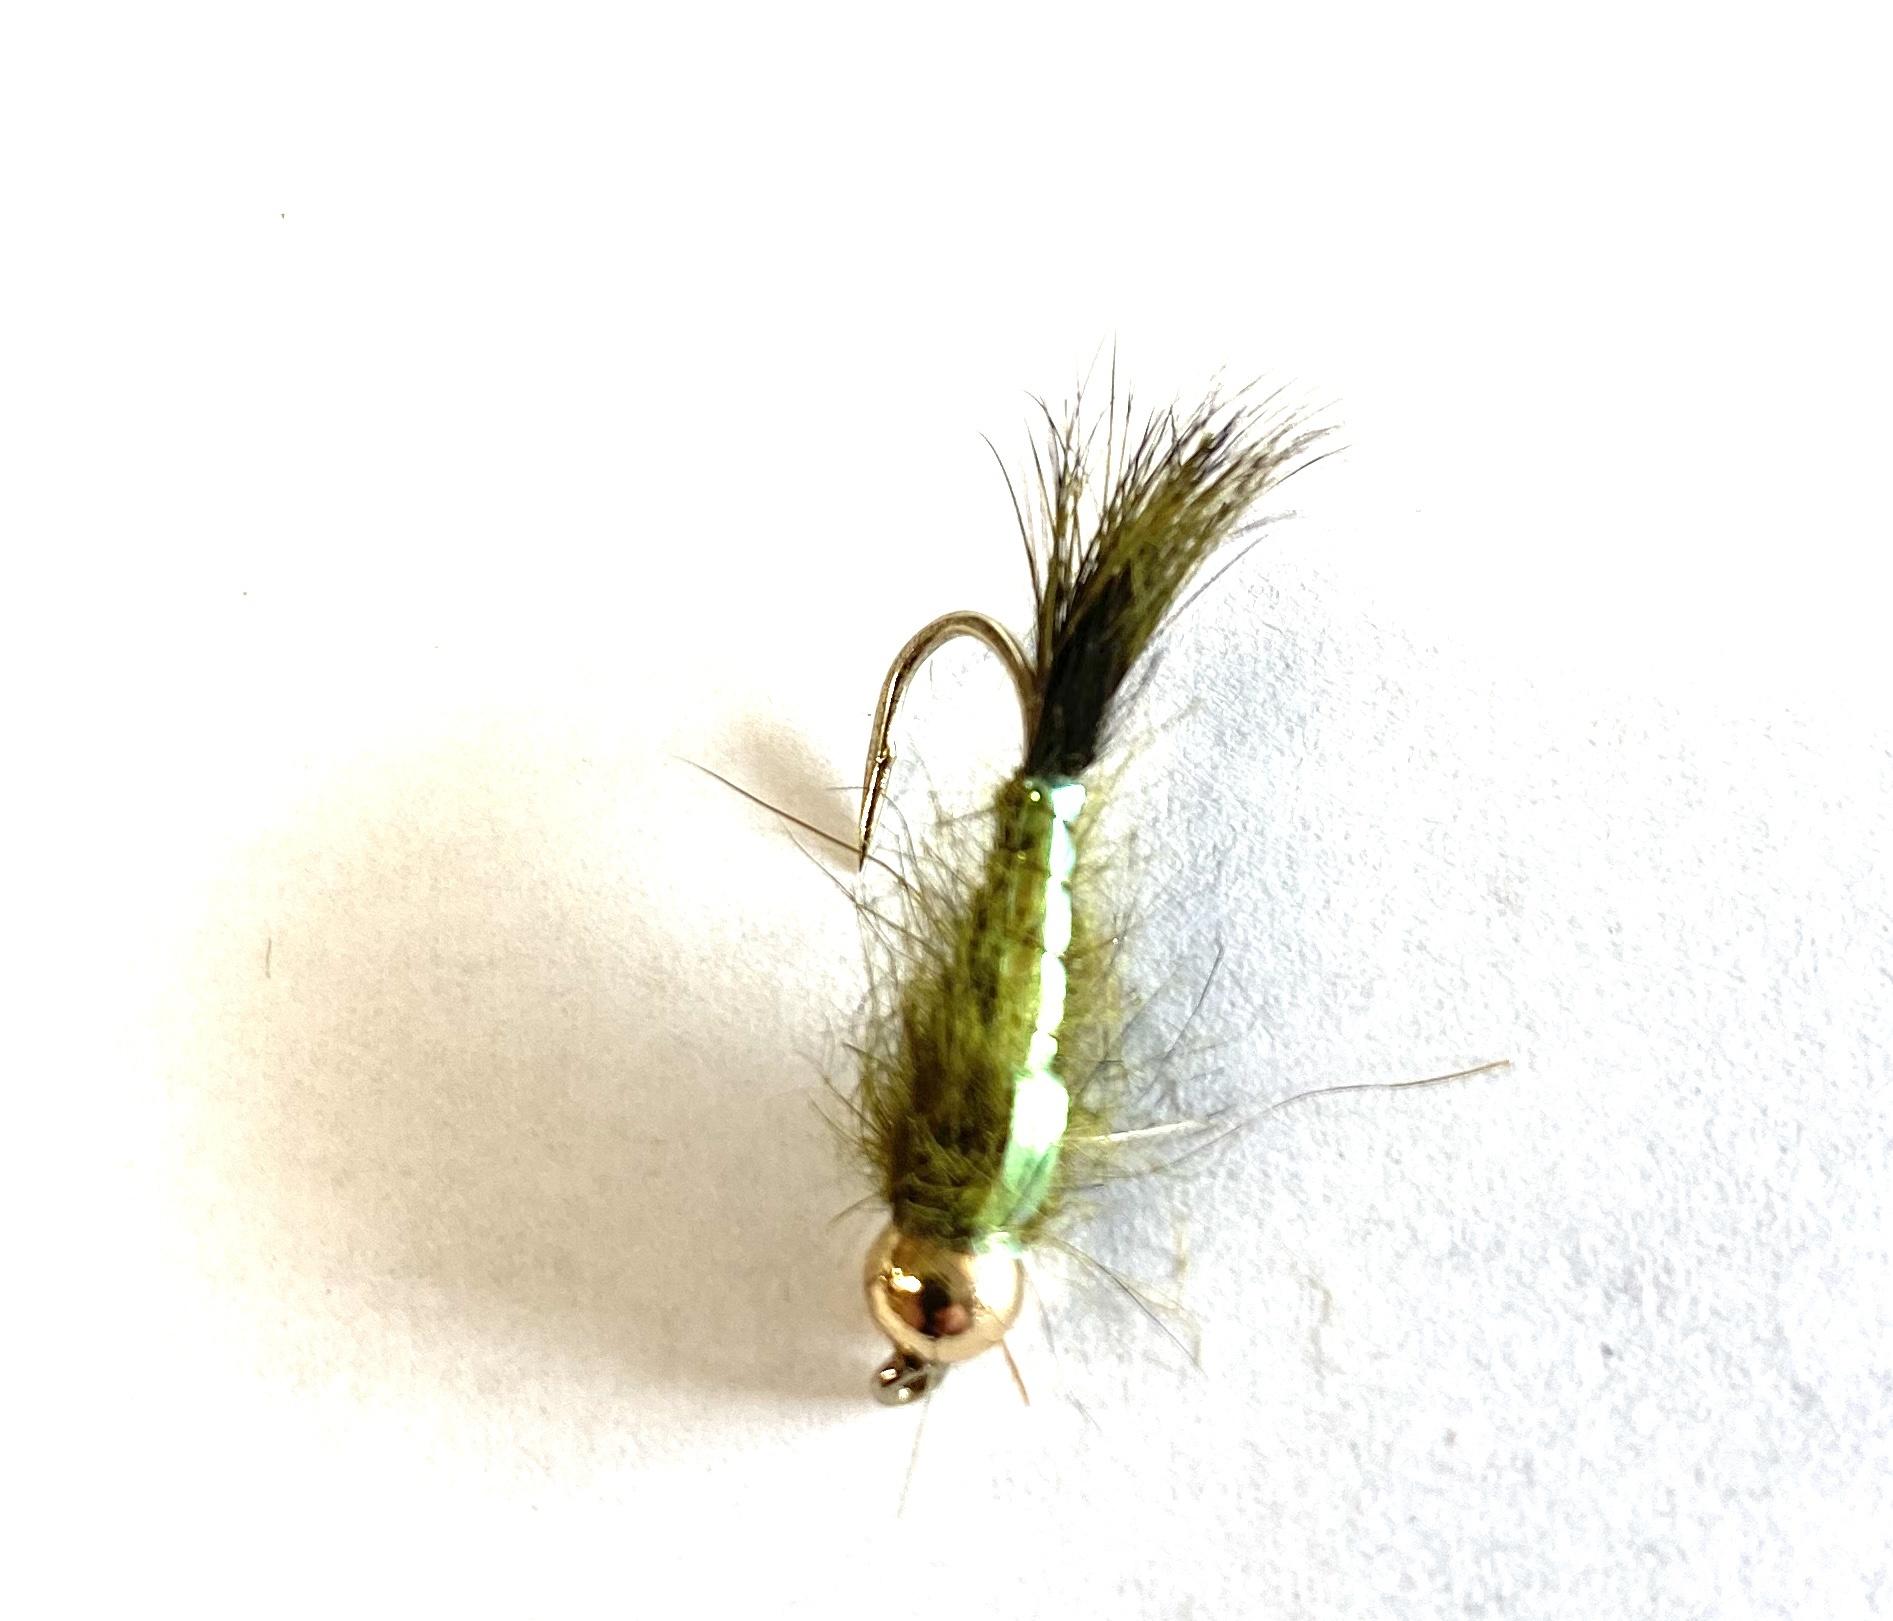 Fulling Mill Tungsten Head Olive Hare's Ear Flashback